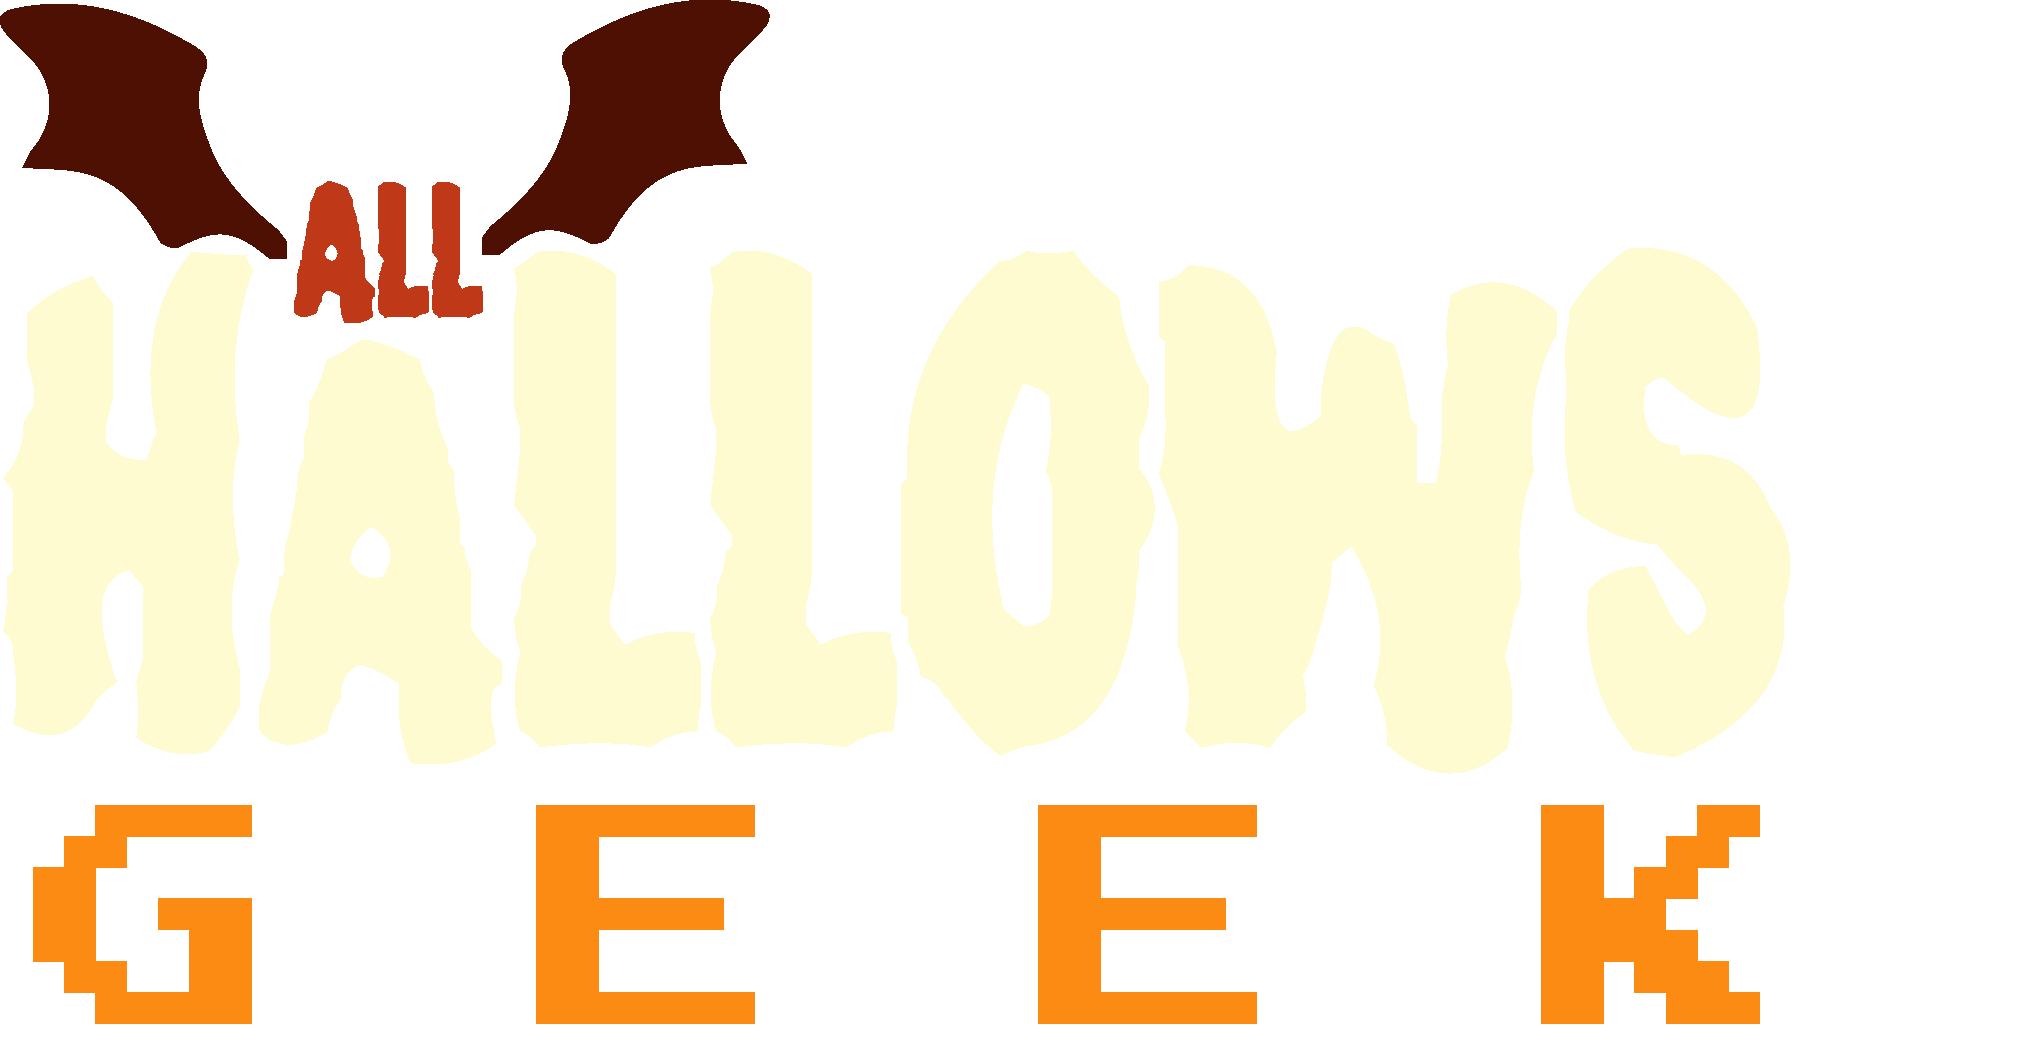 All Hallows Geek